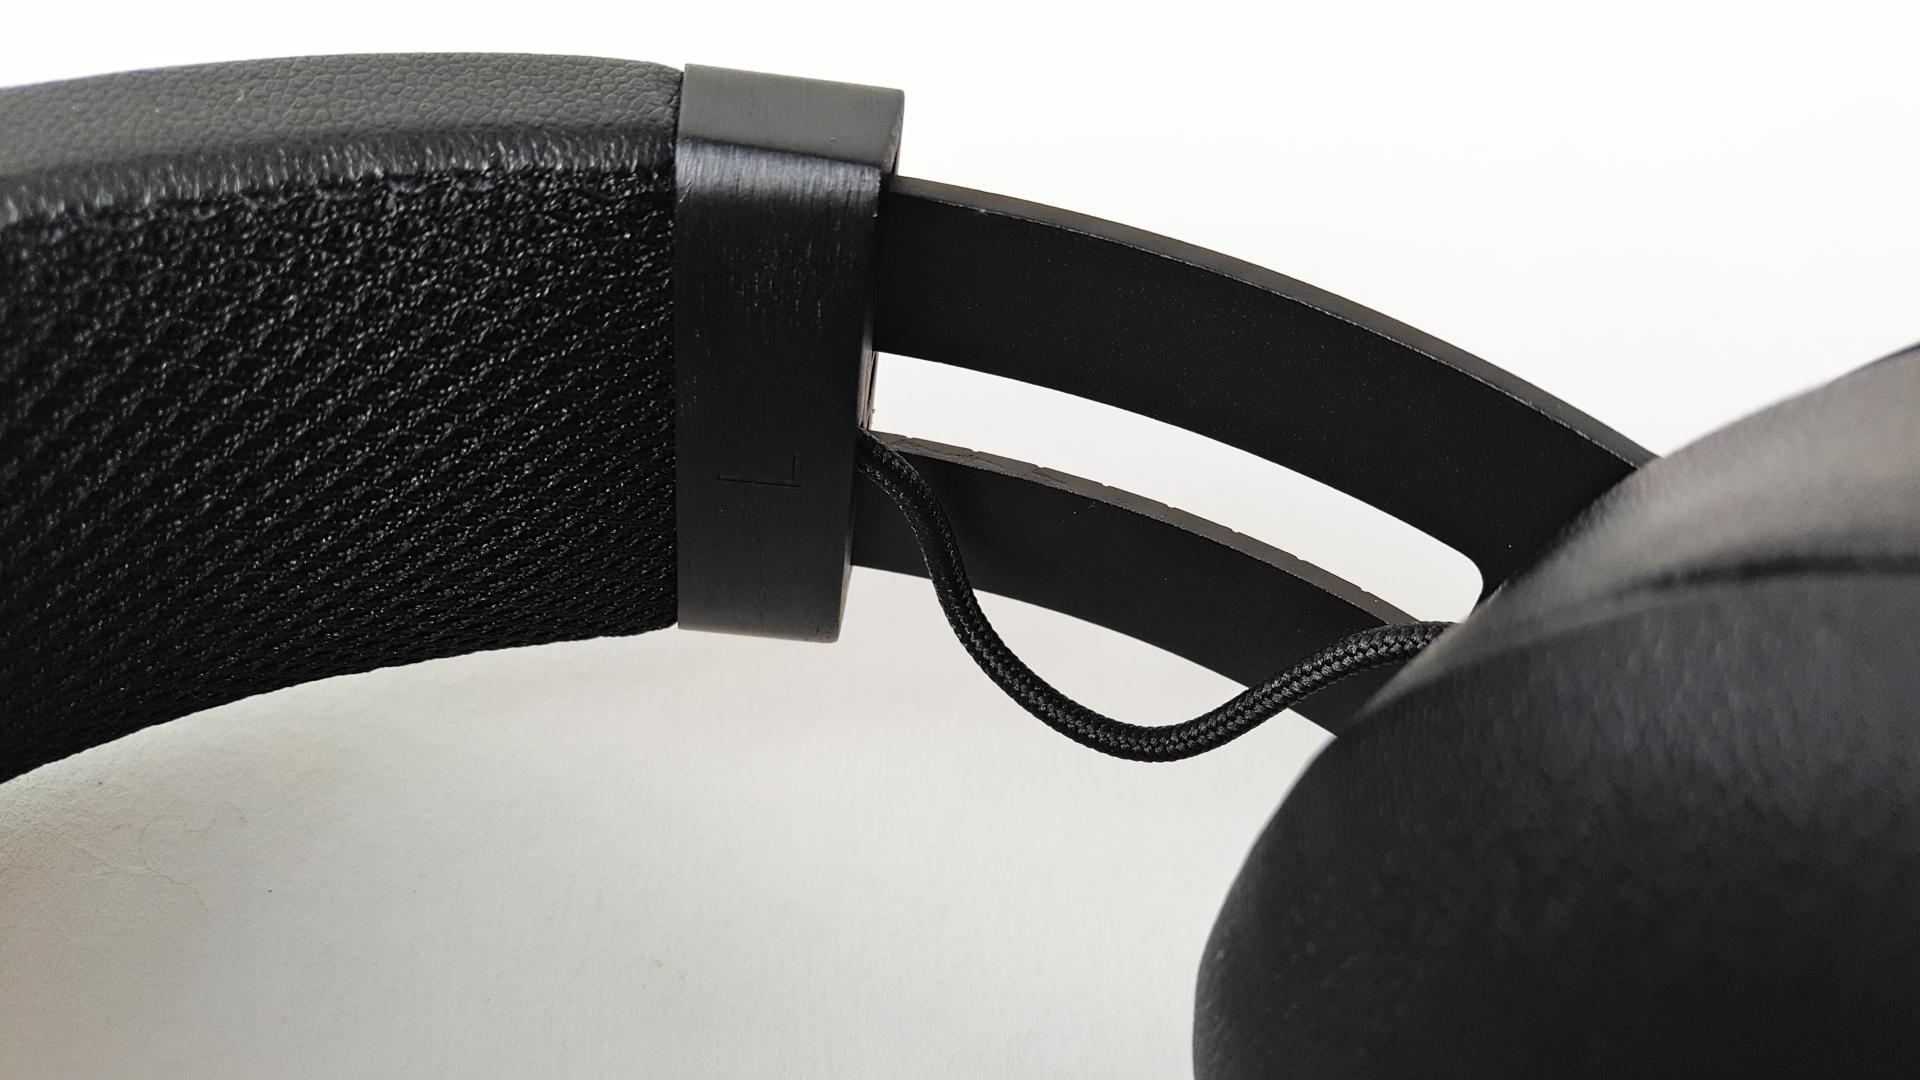 Обзор гарнитуры Razer Kraken 7.1 V2